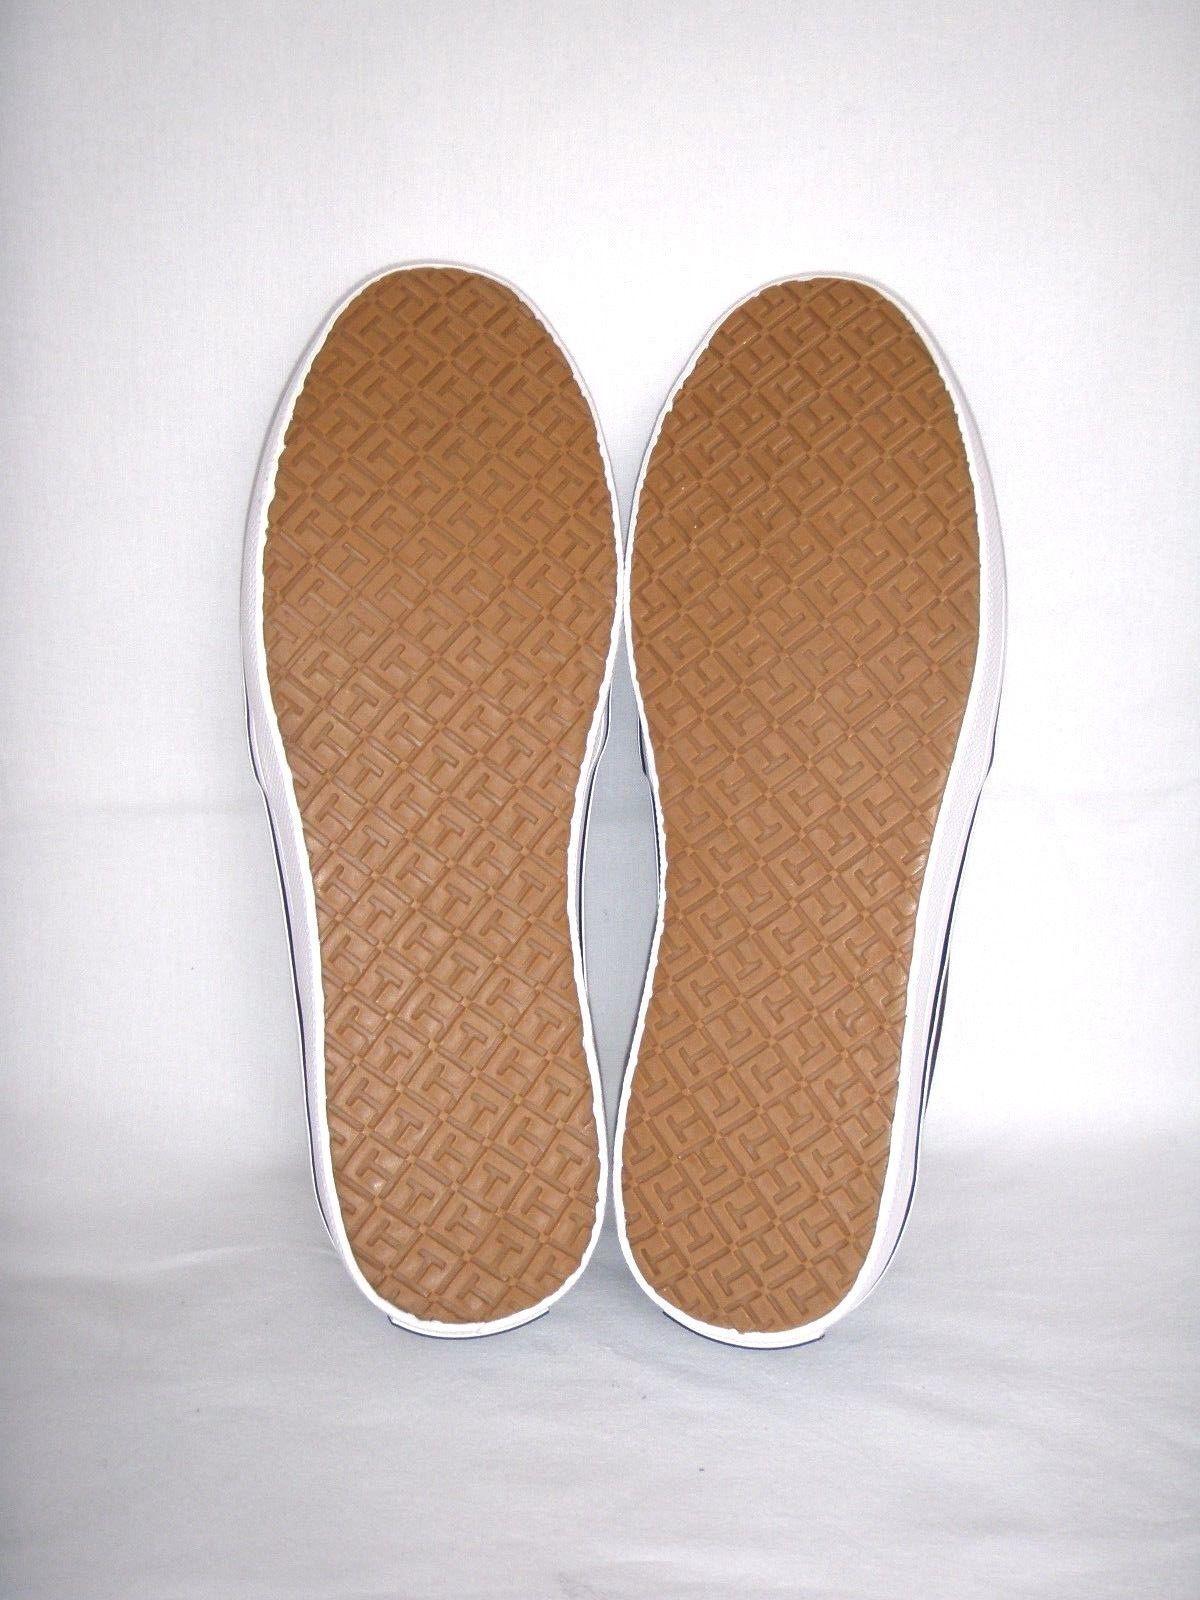 Sneaker Damenschuhe Tommy Hilfiger Nachtblau Slip On-Sneaker Halbschuhe Nachtblau Hilfiger Gr.41 c9c7ae